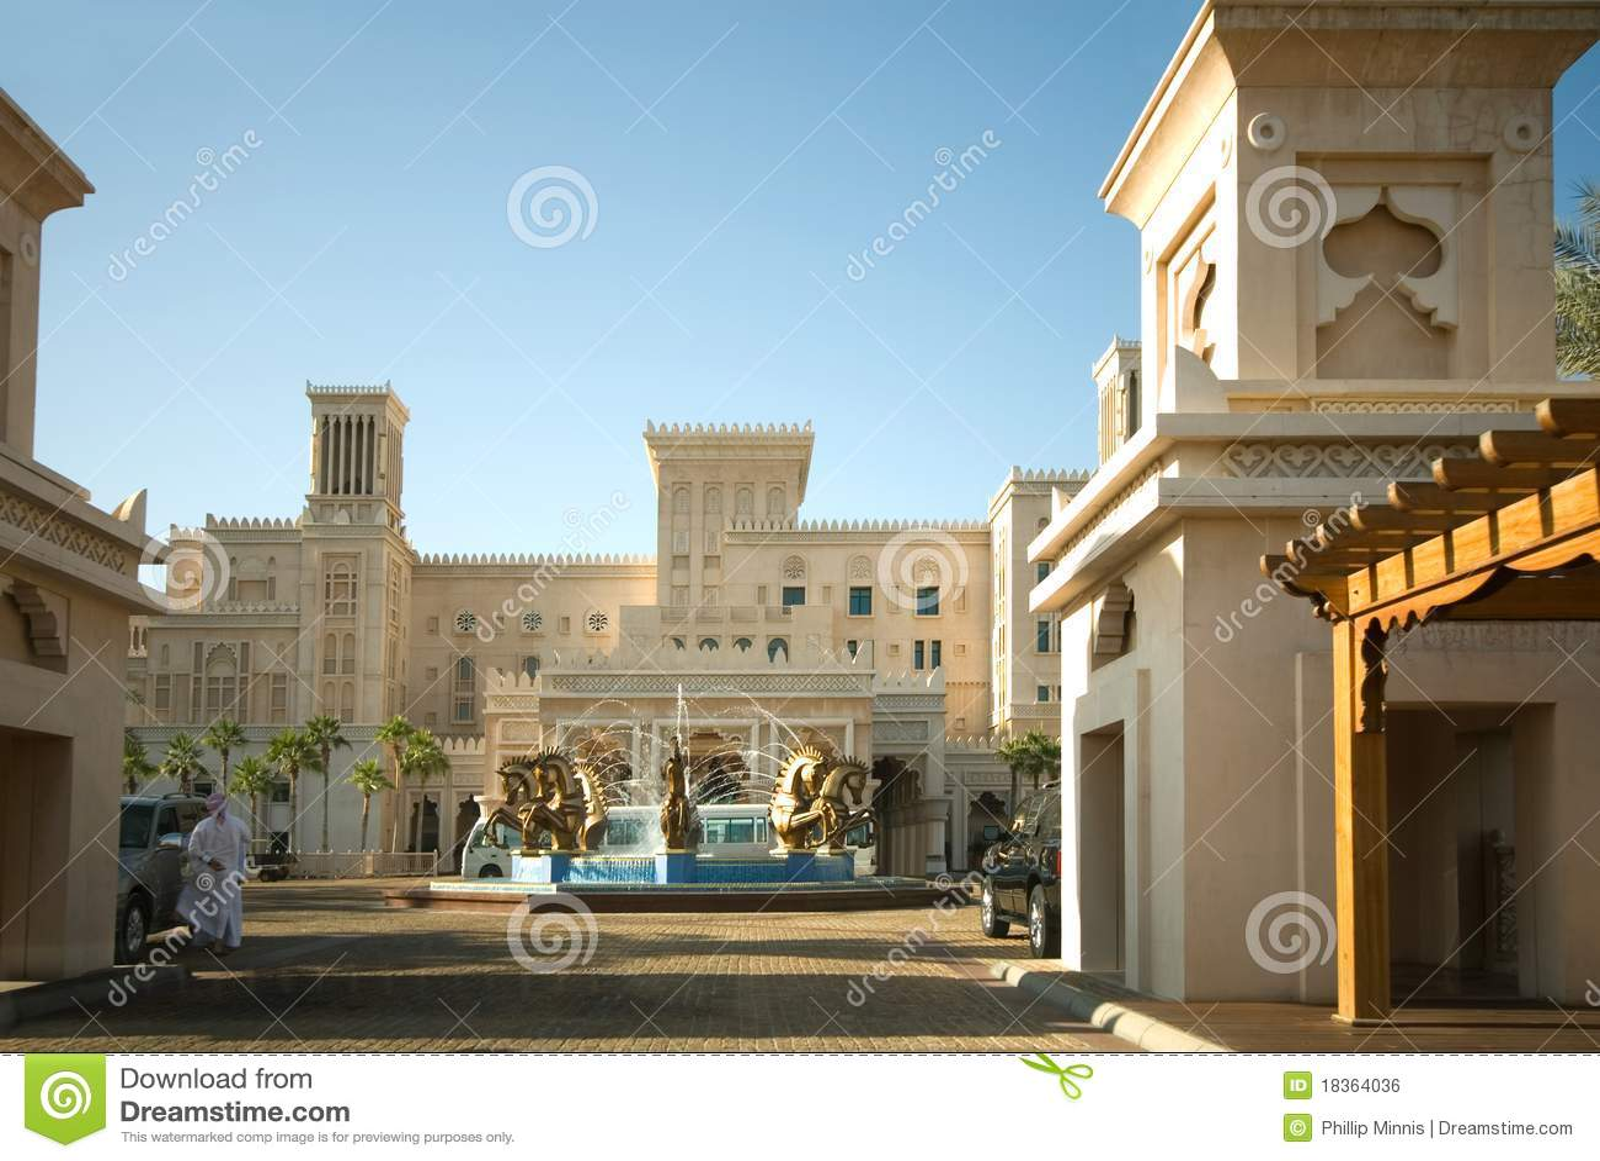 Arab dubai emirates hotel luxury